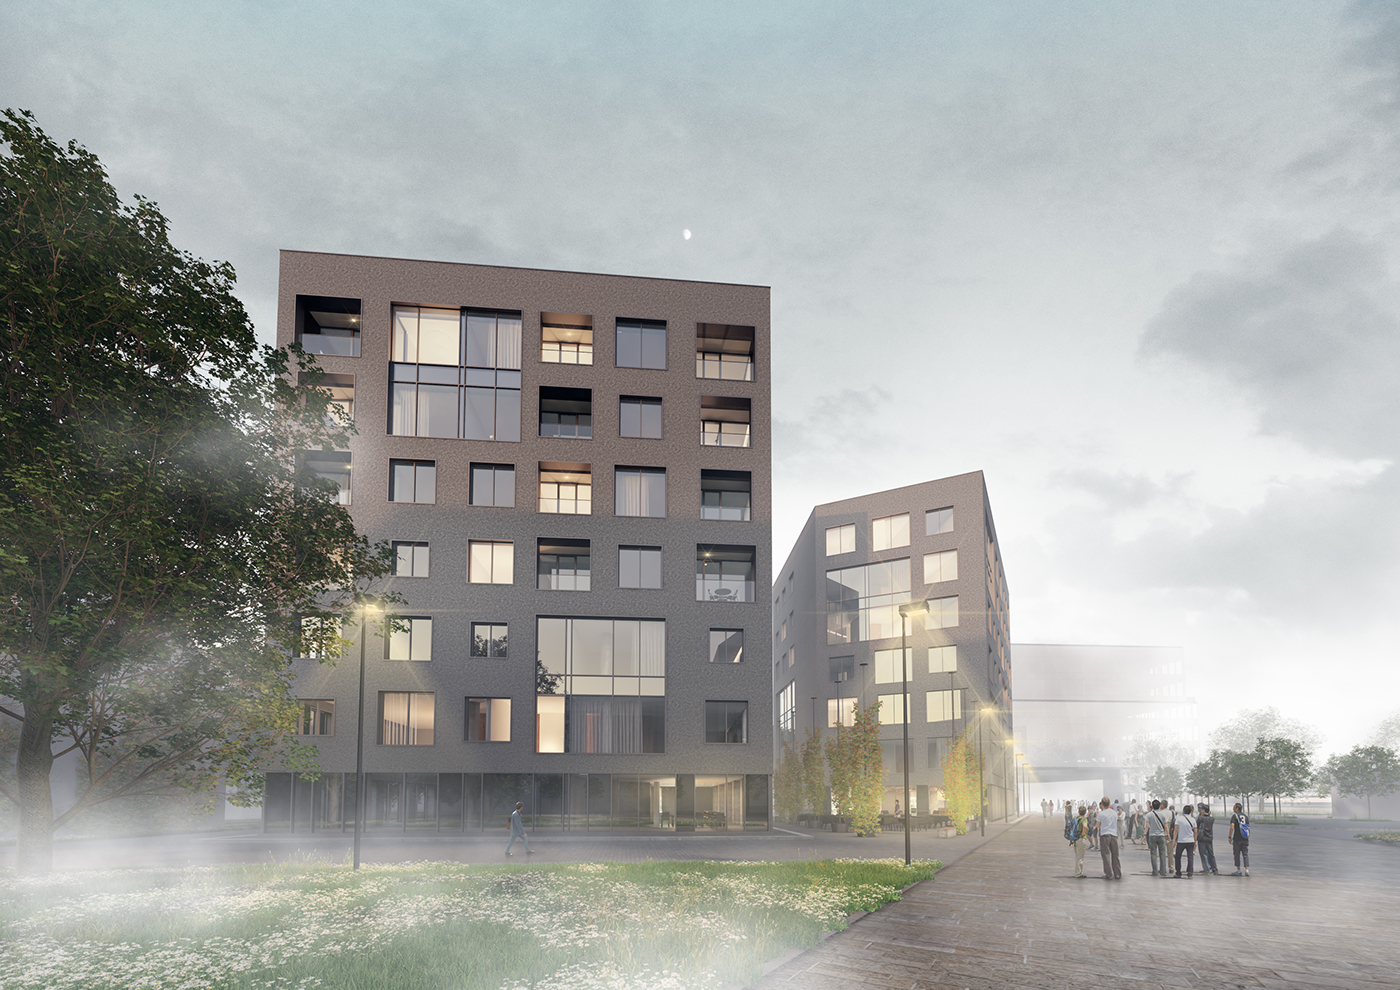 apartment building archviz Renders visualisation Architectural Visualisation lithuania Indeed 3D Studio